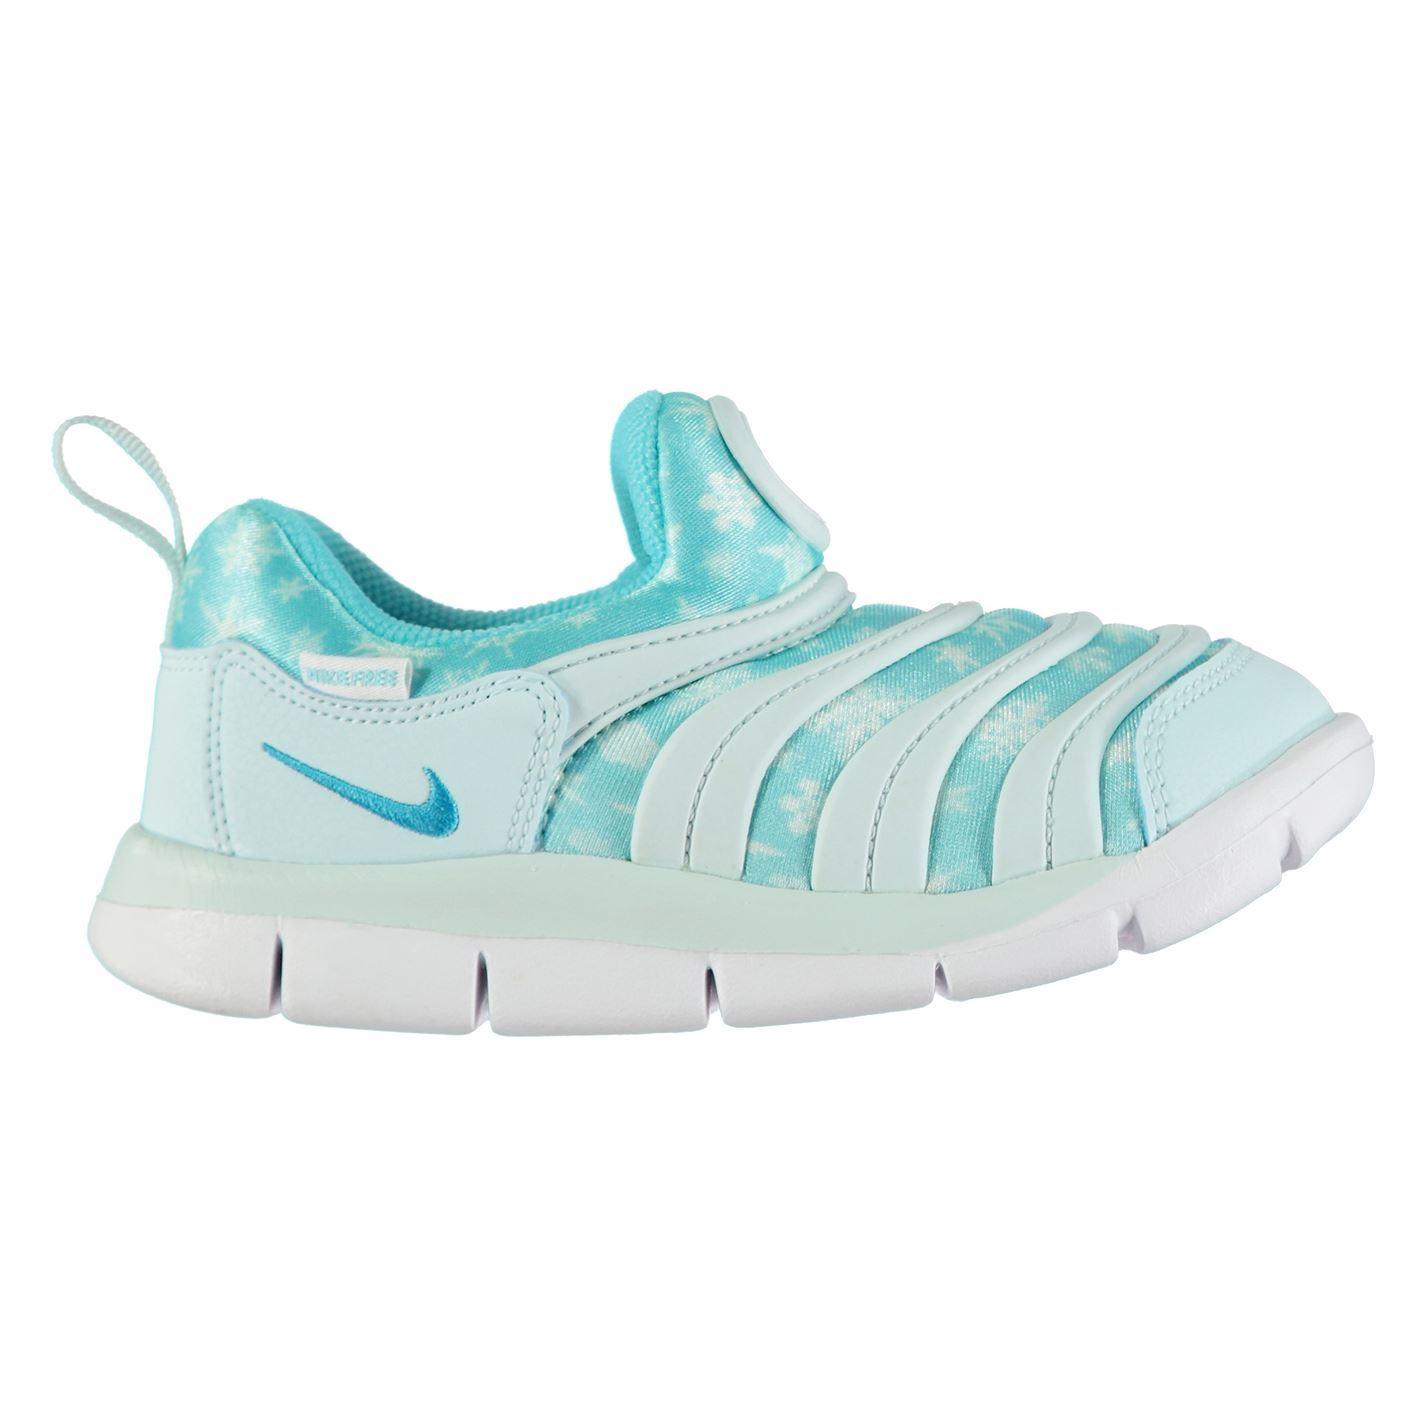 485ca0f5f85d8 ... Nike Dynamo Free Print Girls Trainers Blue Blue Shoes Footwear ...